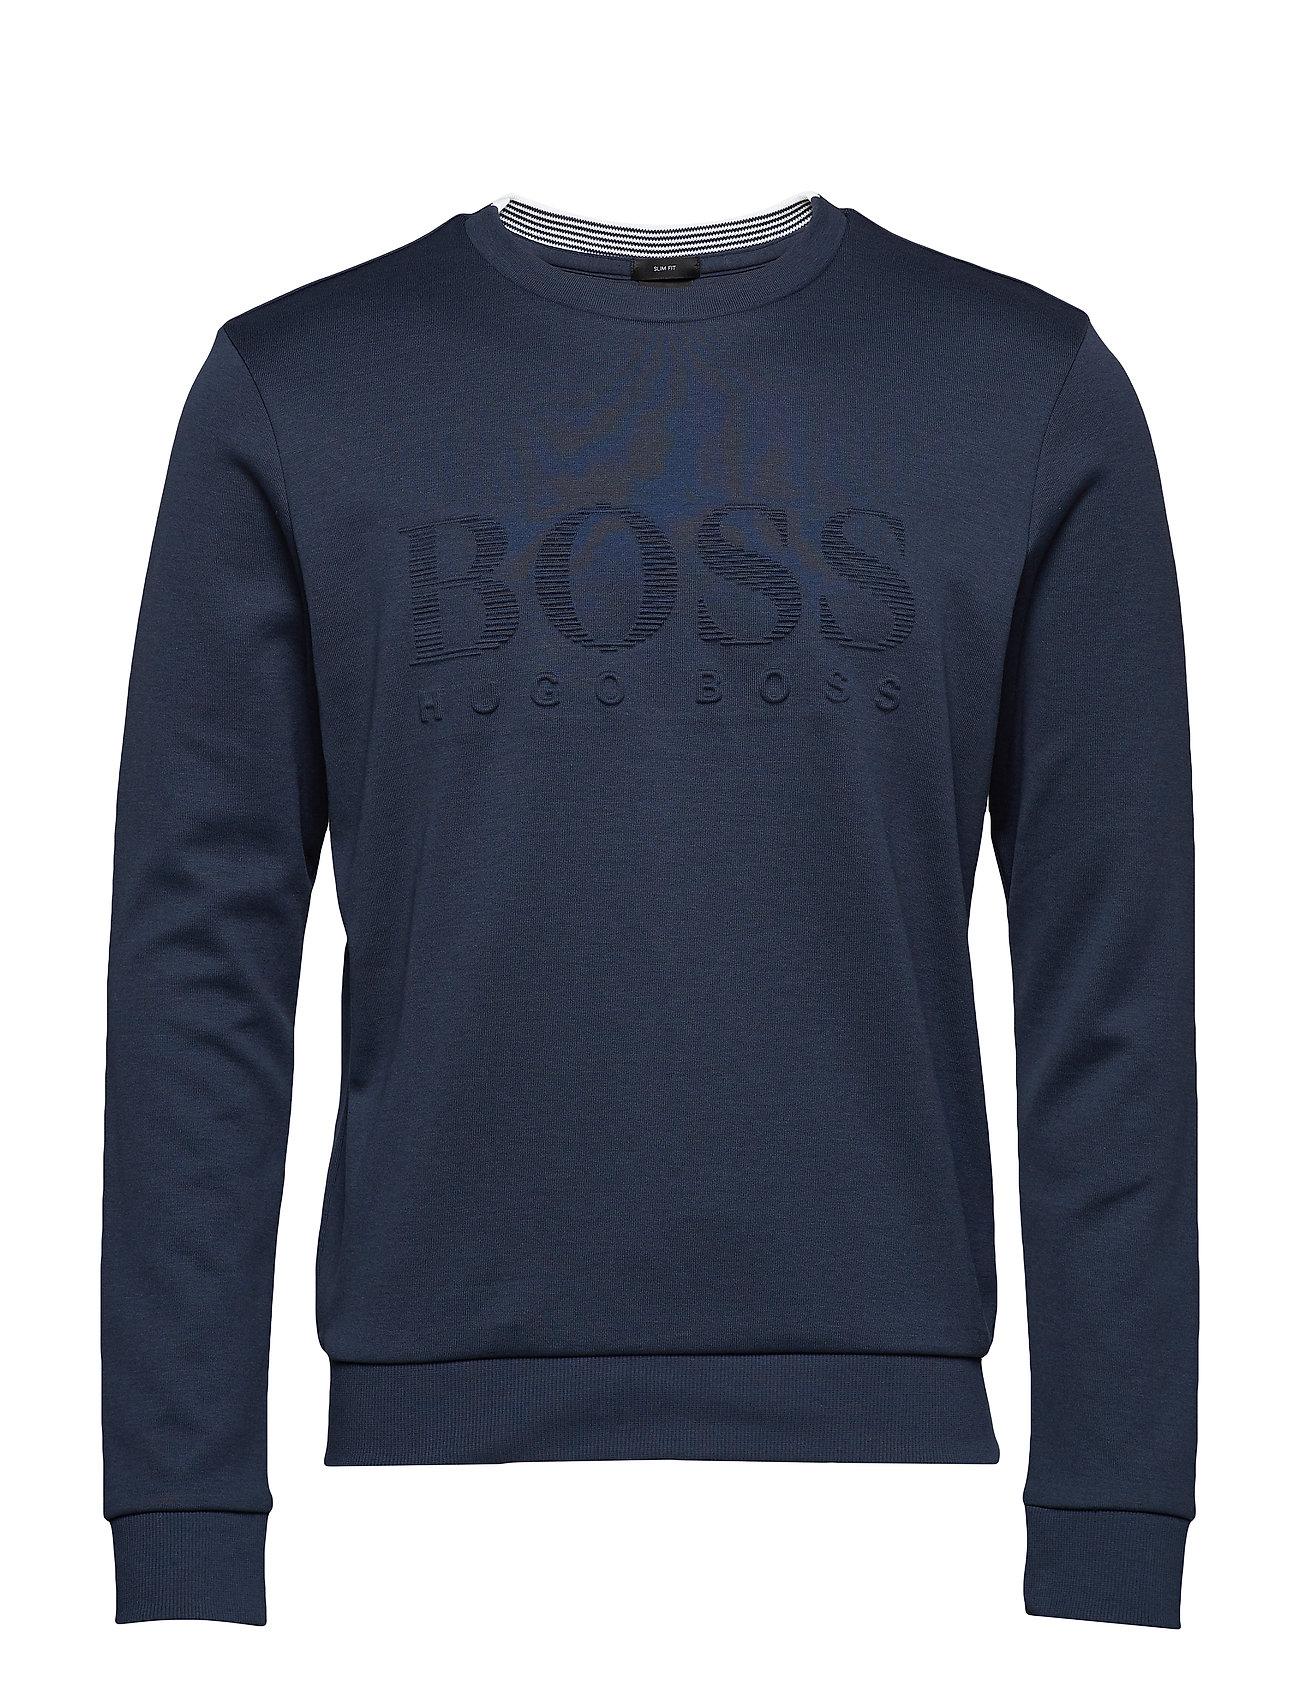 Boss Athleisure Wear Salbo Ögrönlar